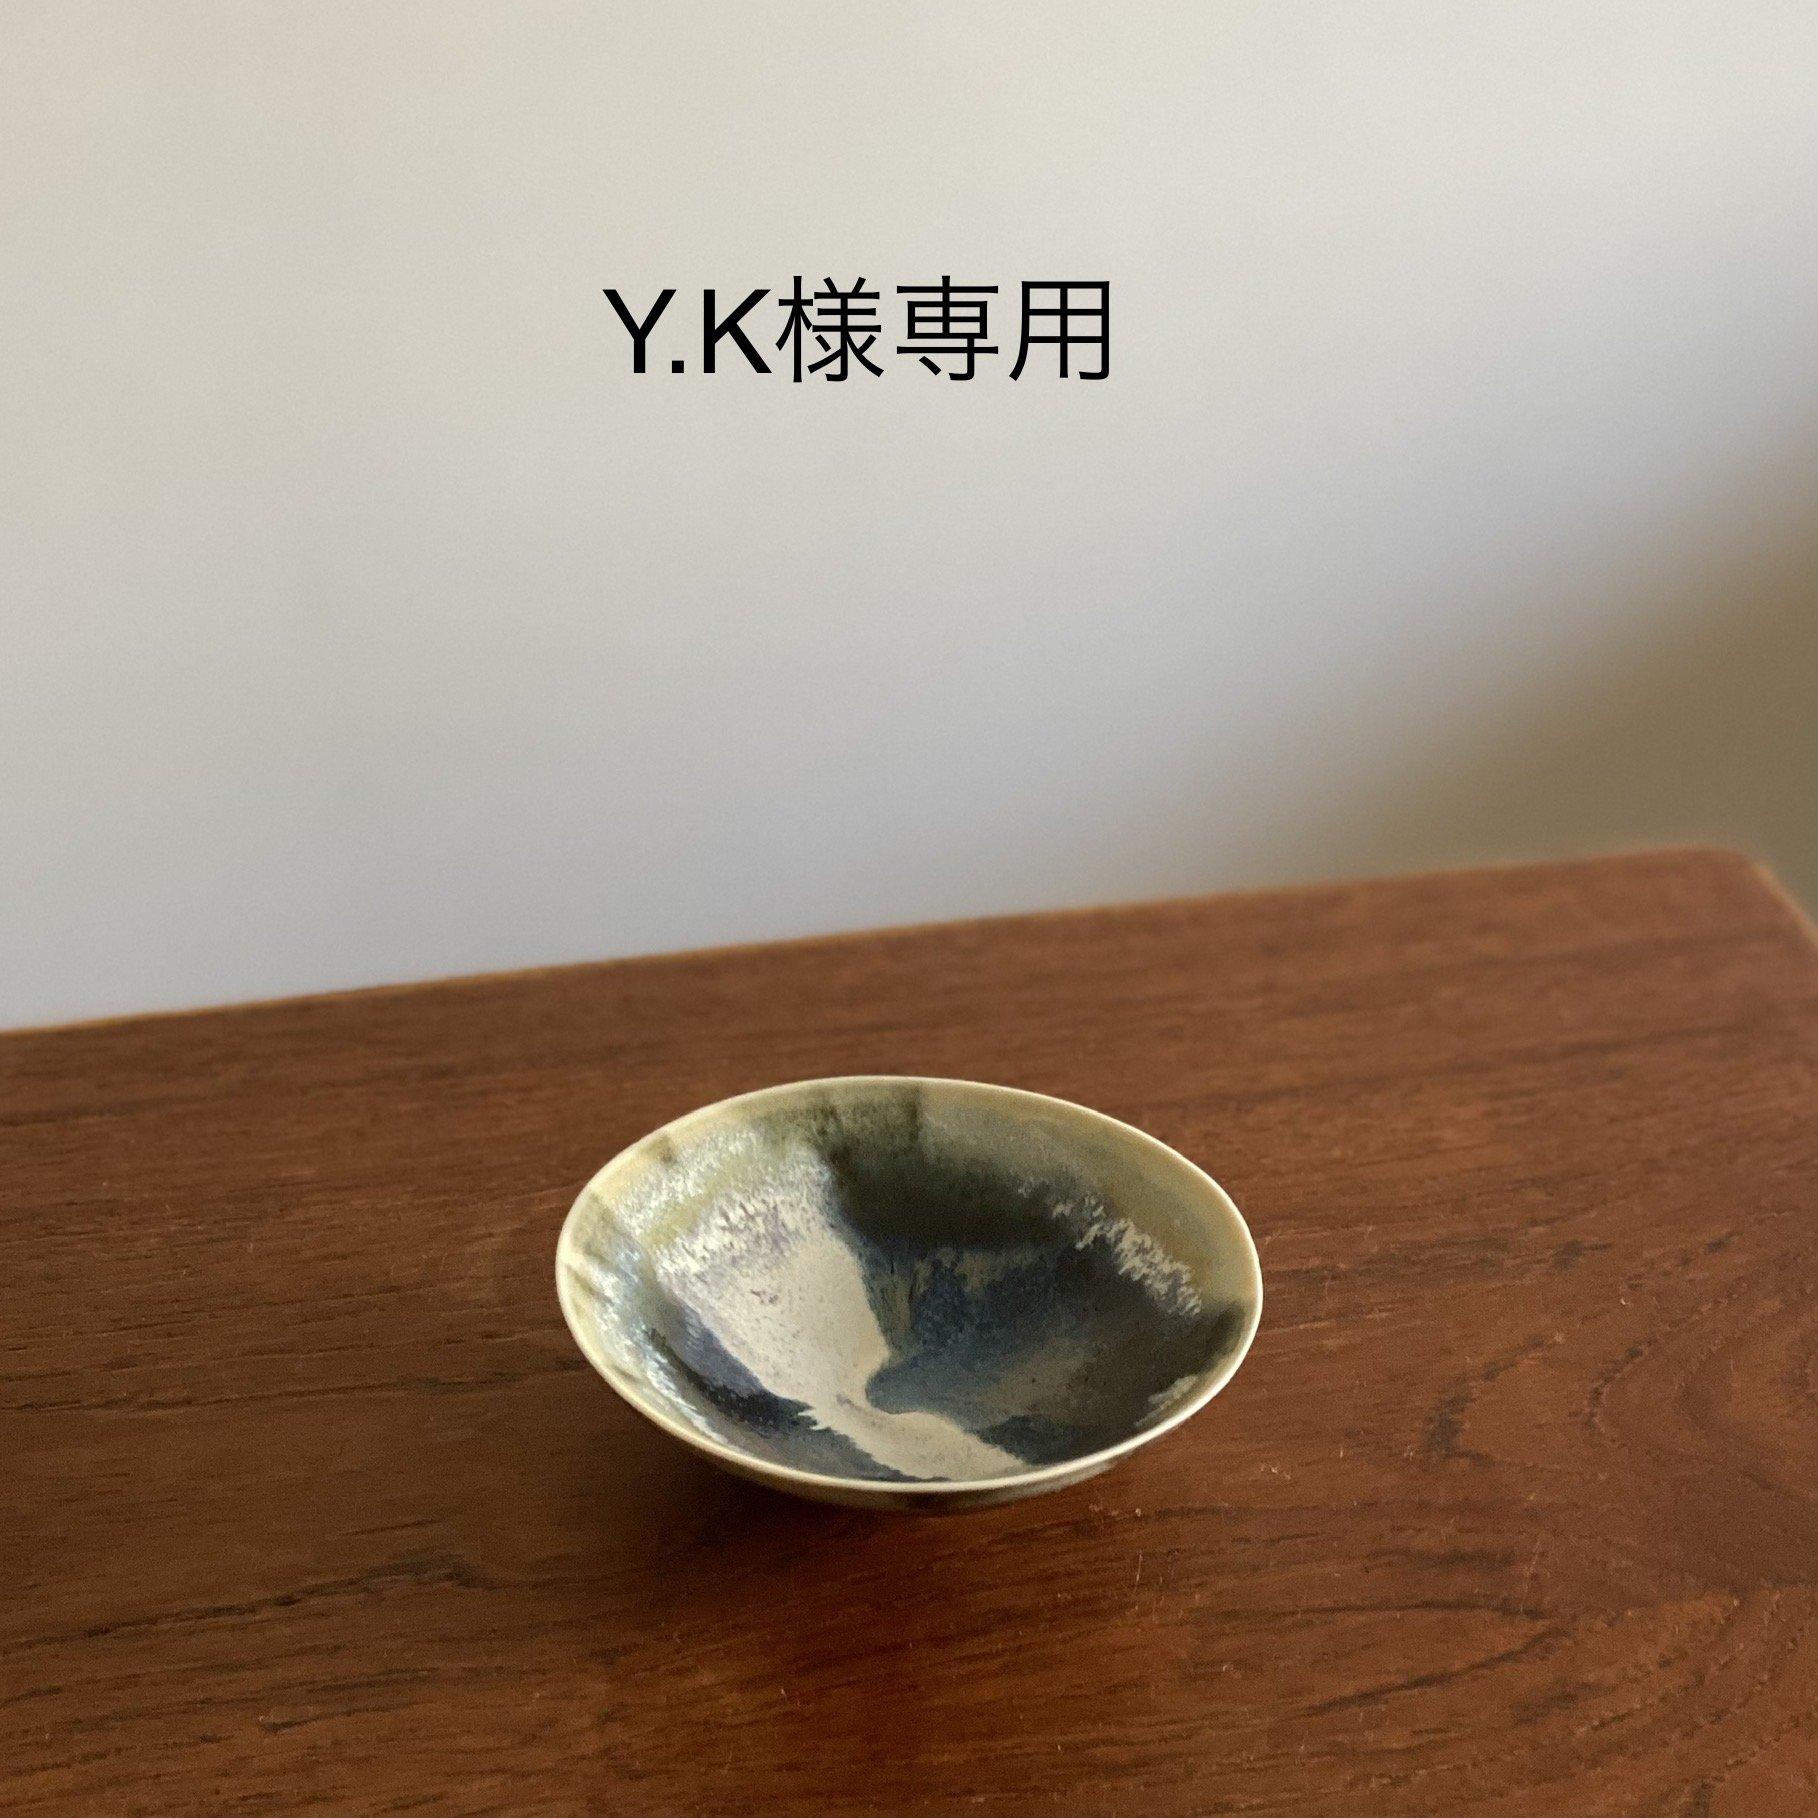 Y.K様専用 お猪口のイメージその1